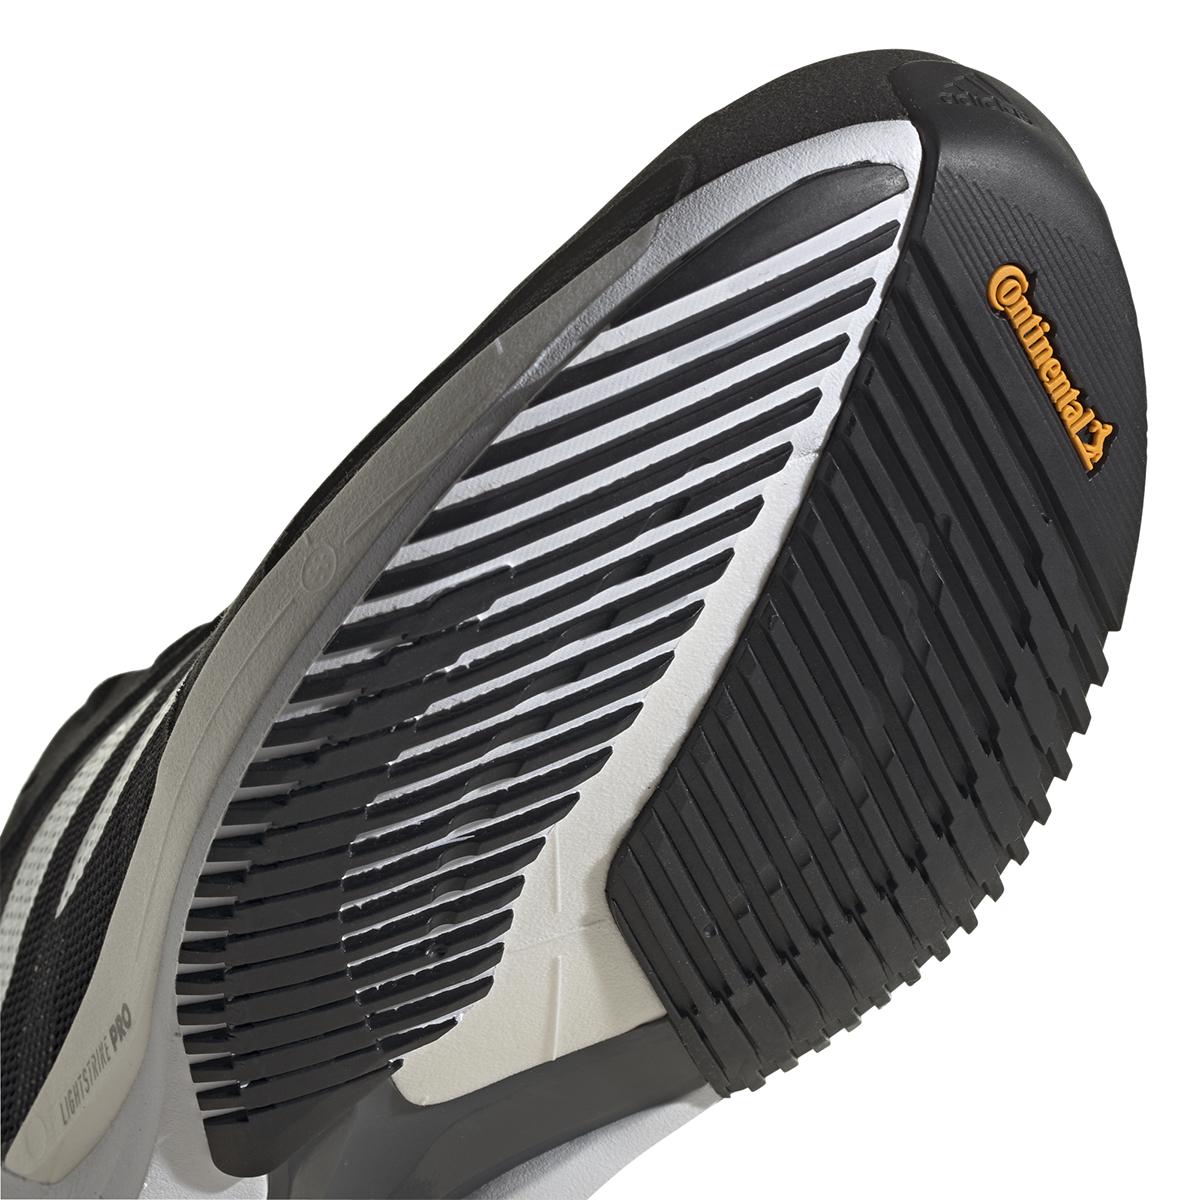 Men's Adidas Adizero Adios 6 Running Shoe - Color: Black/White/Grey - Size: 6 - Width: Regular, Black/White/Grey, large, image 4